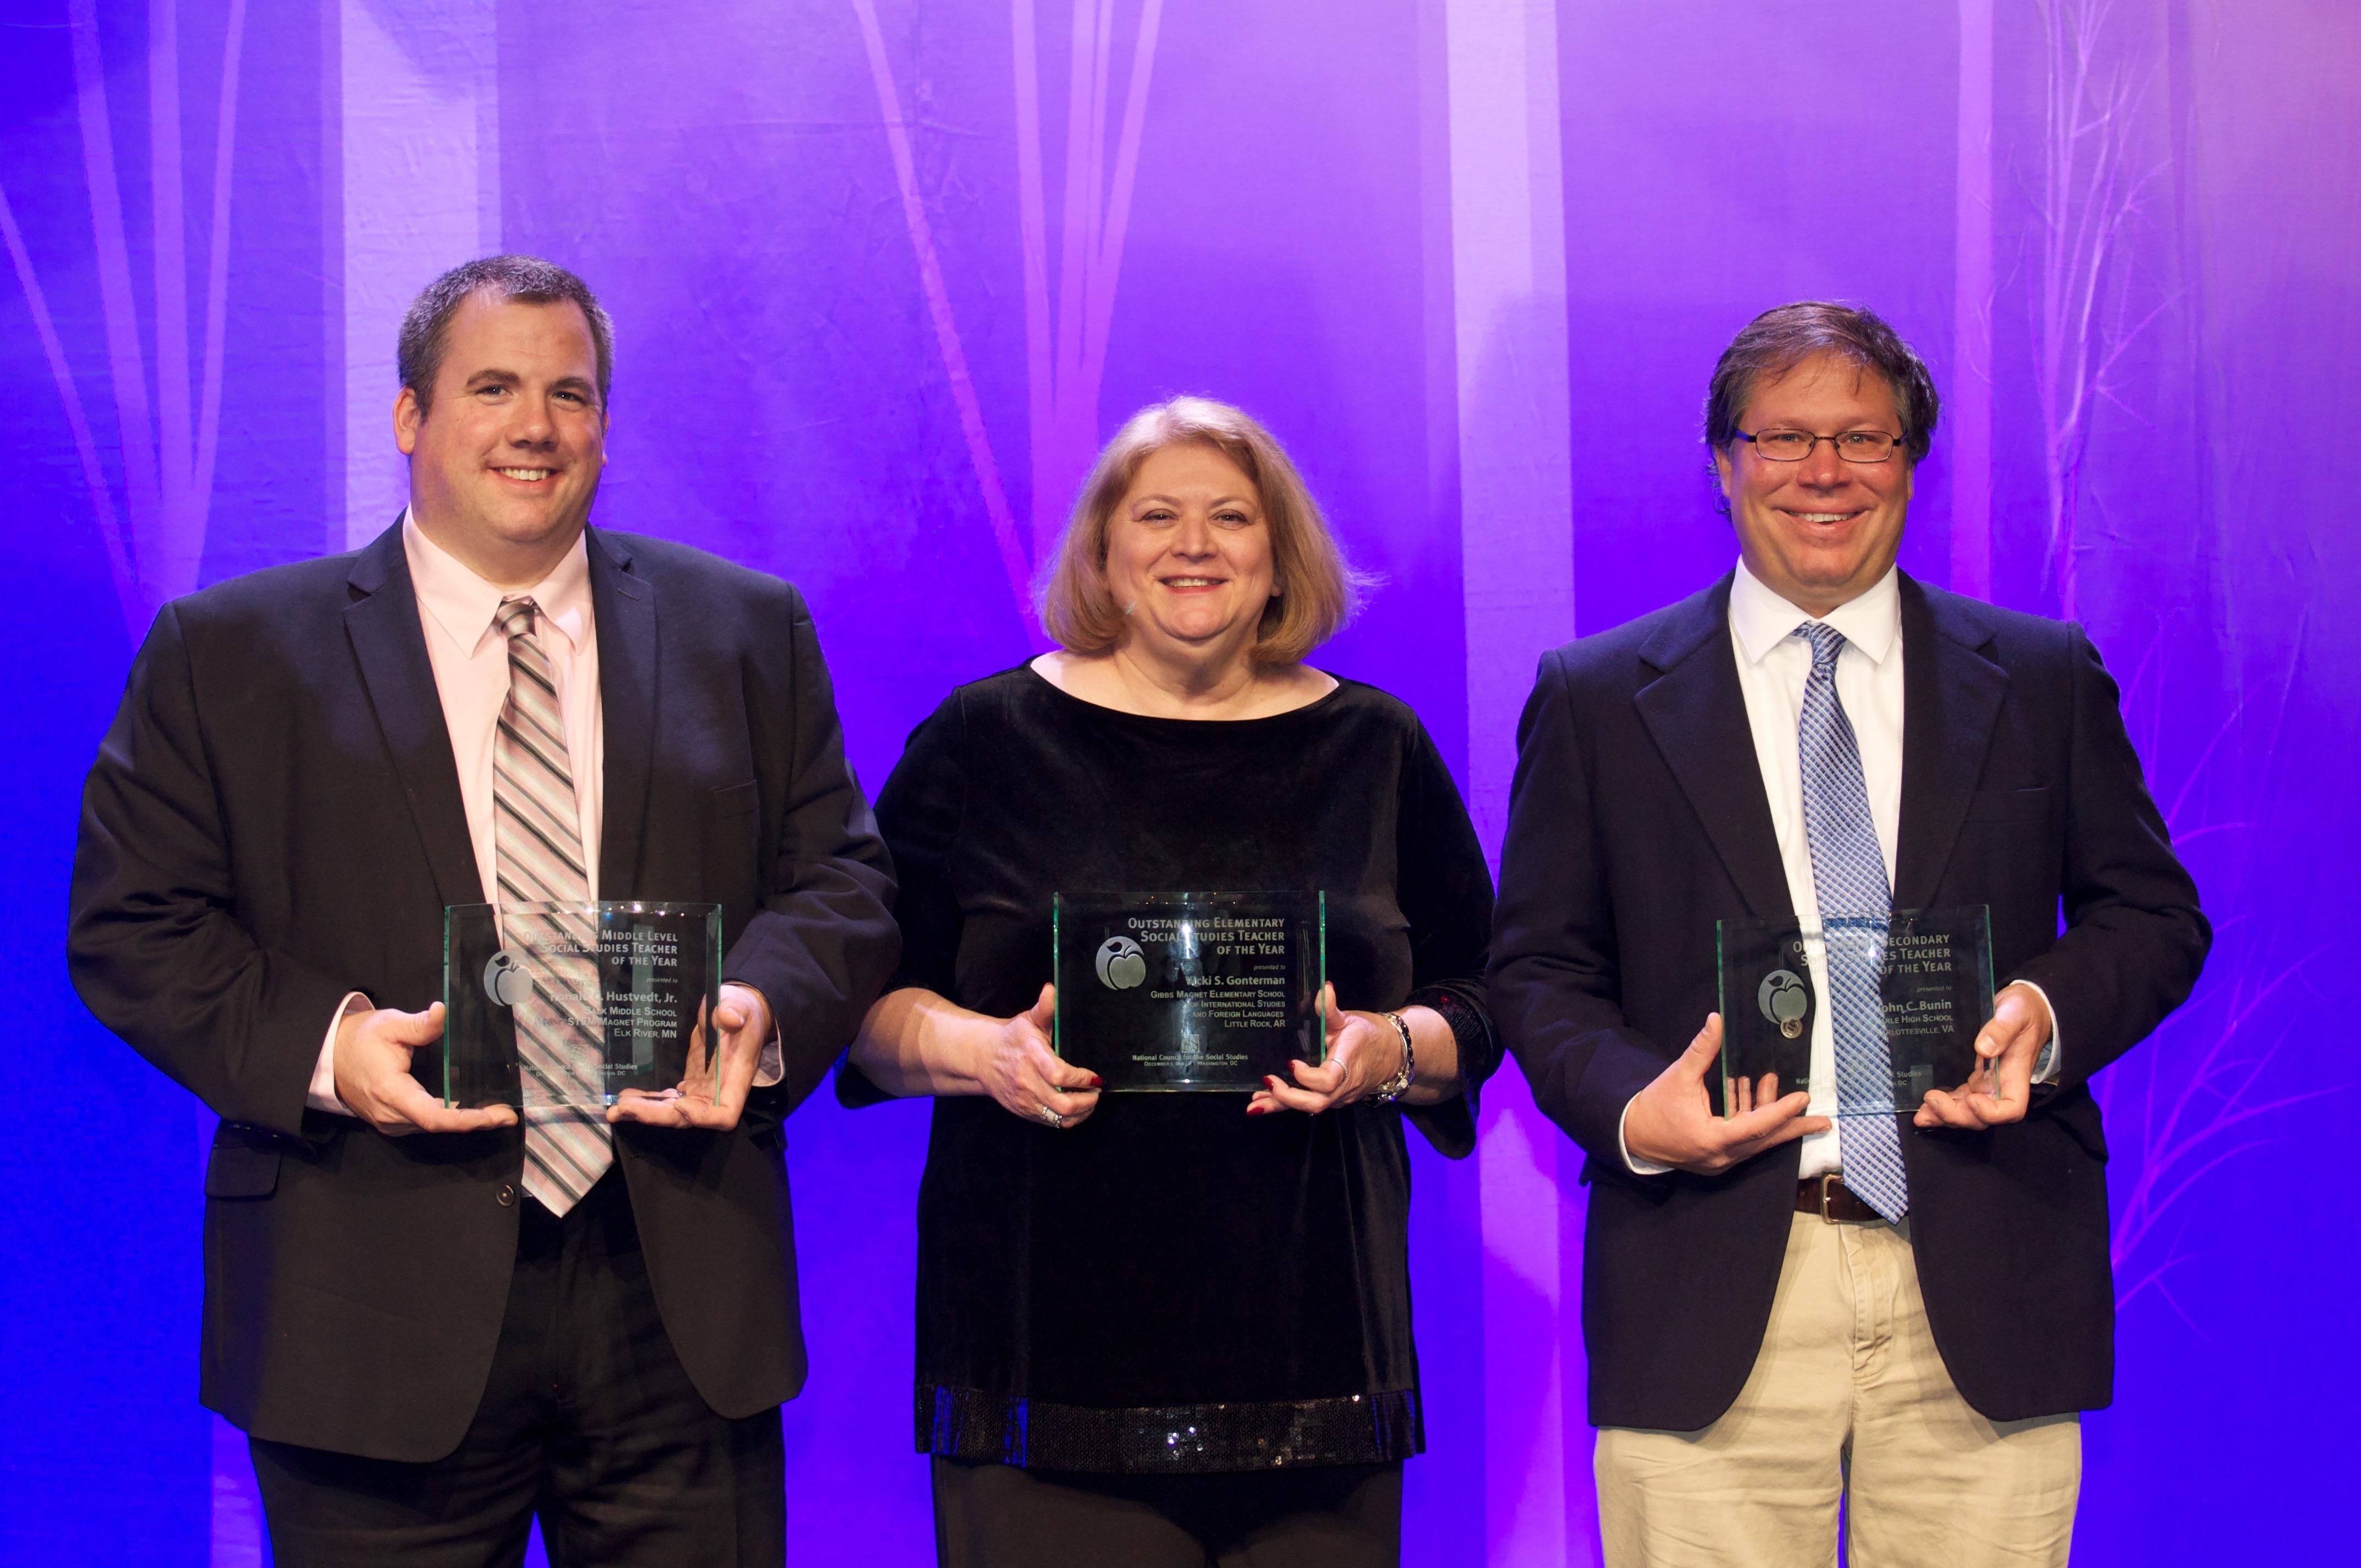 Outstanding Social Studies Teachers of the Year